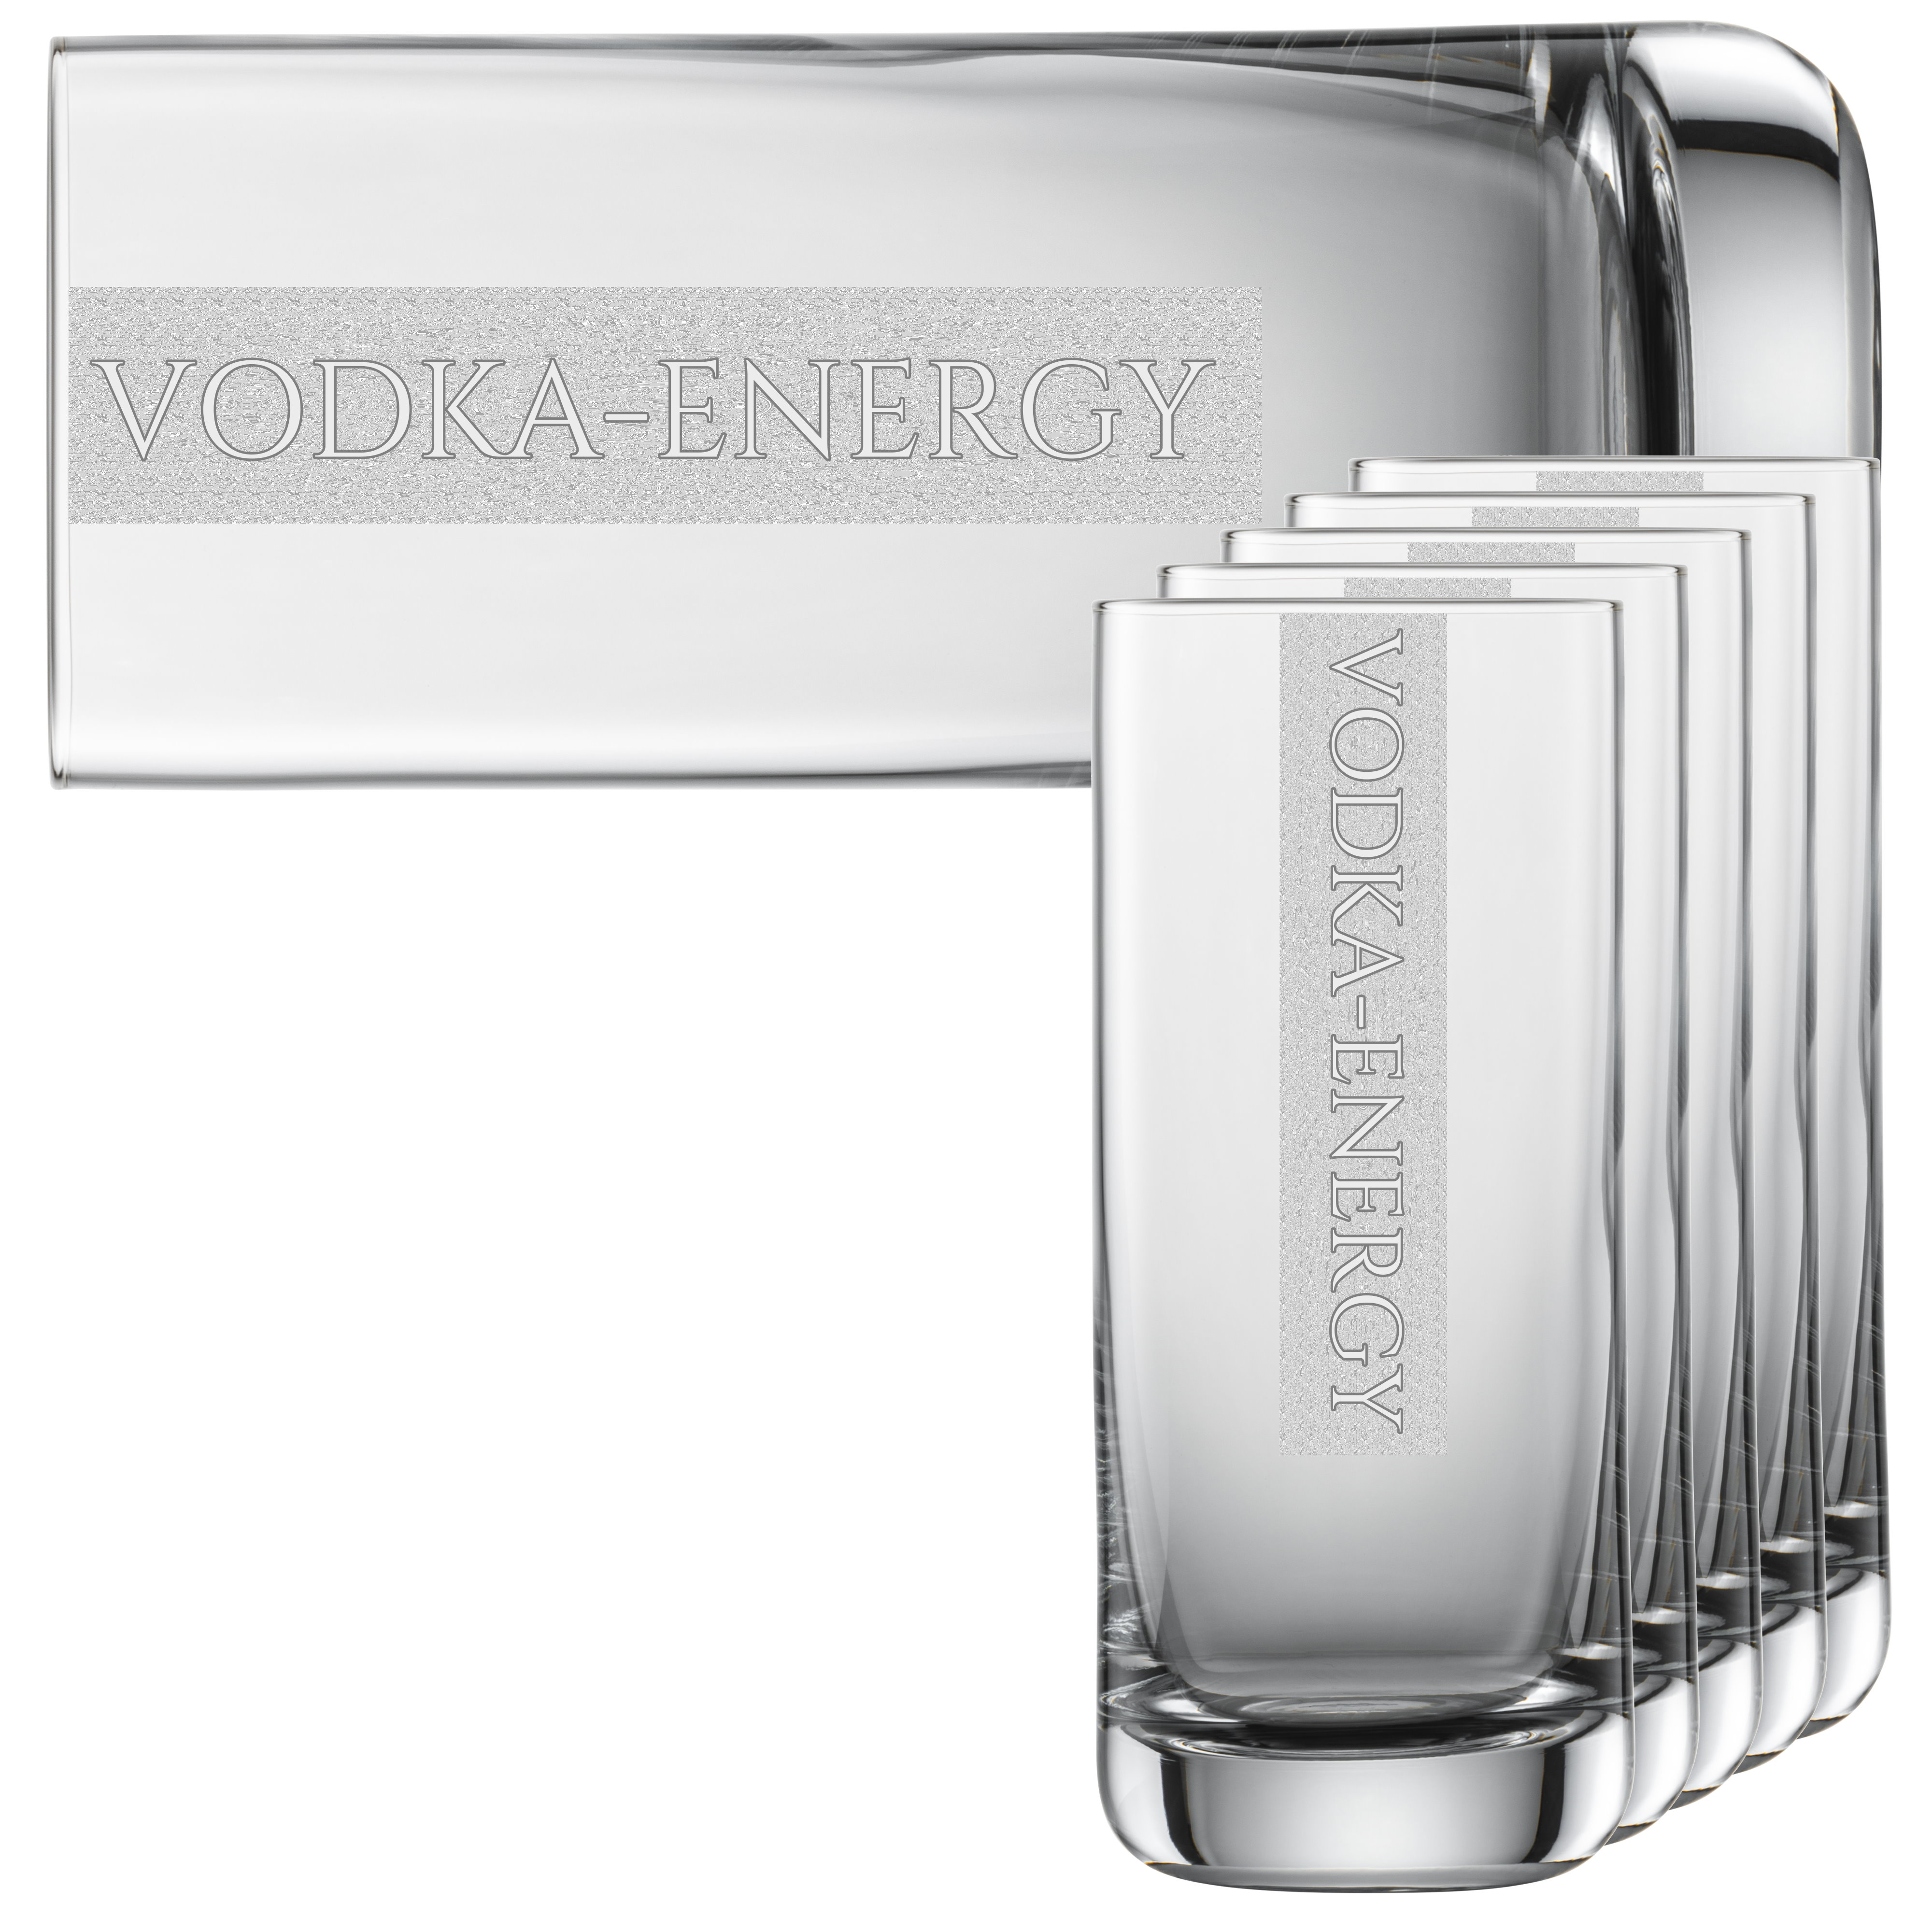 VODKA-ENERGY Gläser | 6 Stück 390ml Schott Longdrinkglas | CoolGlas